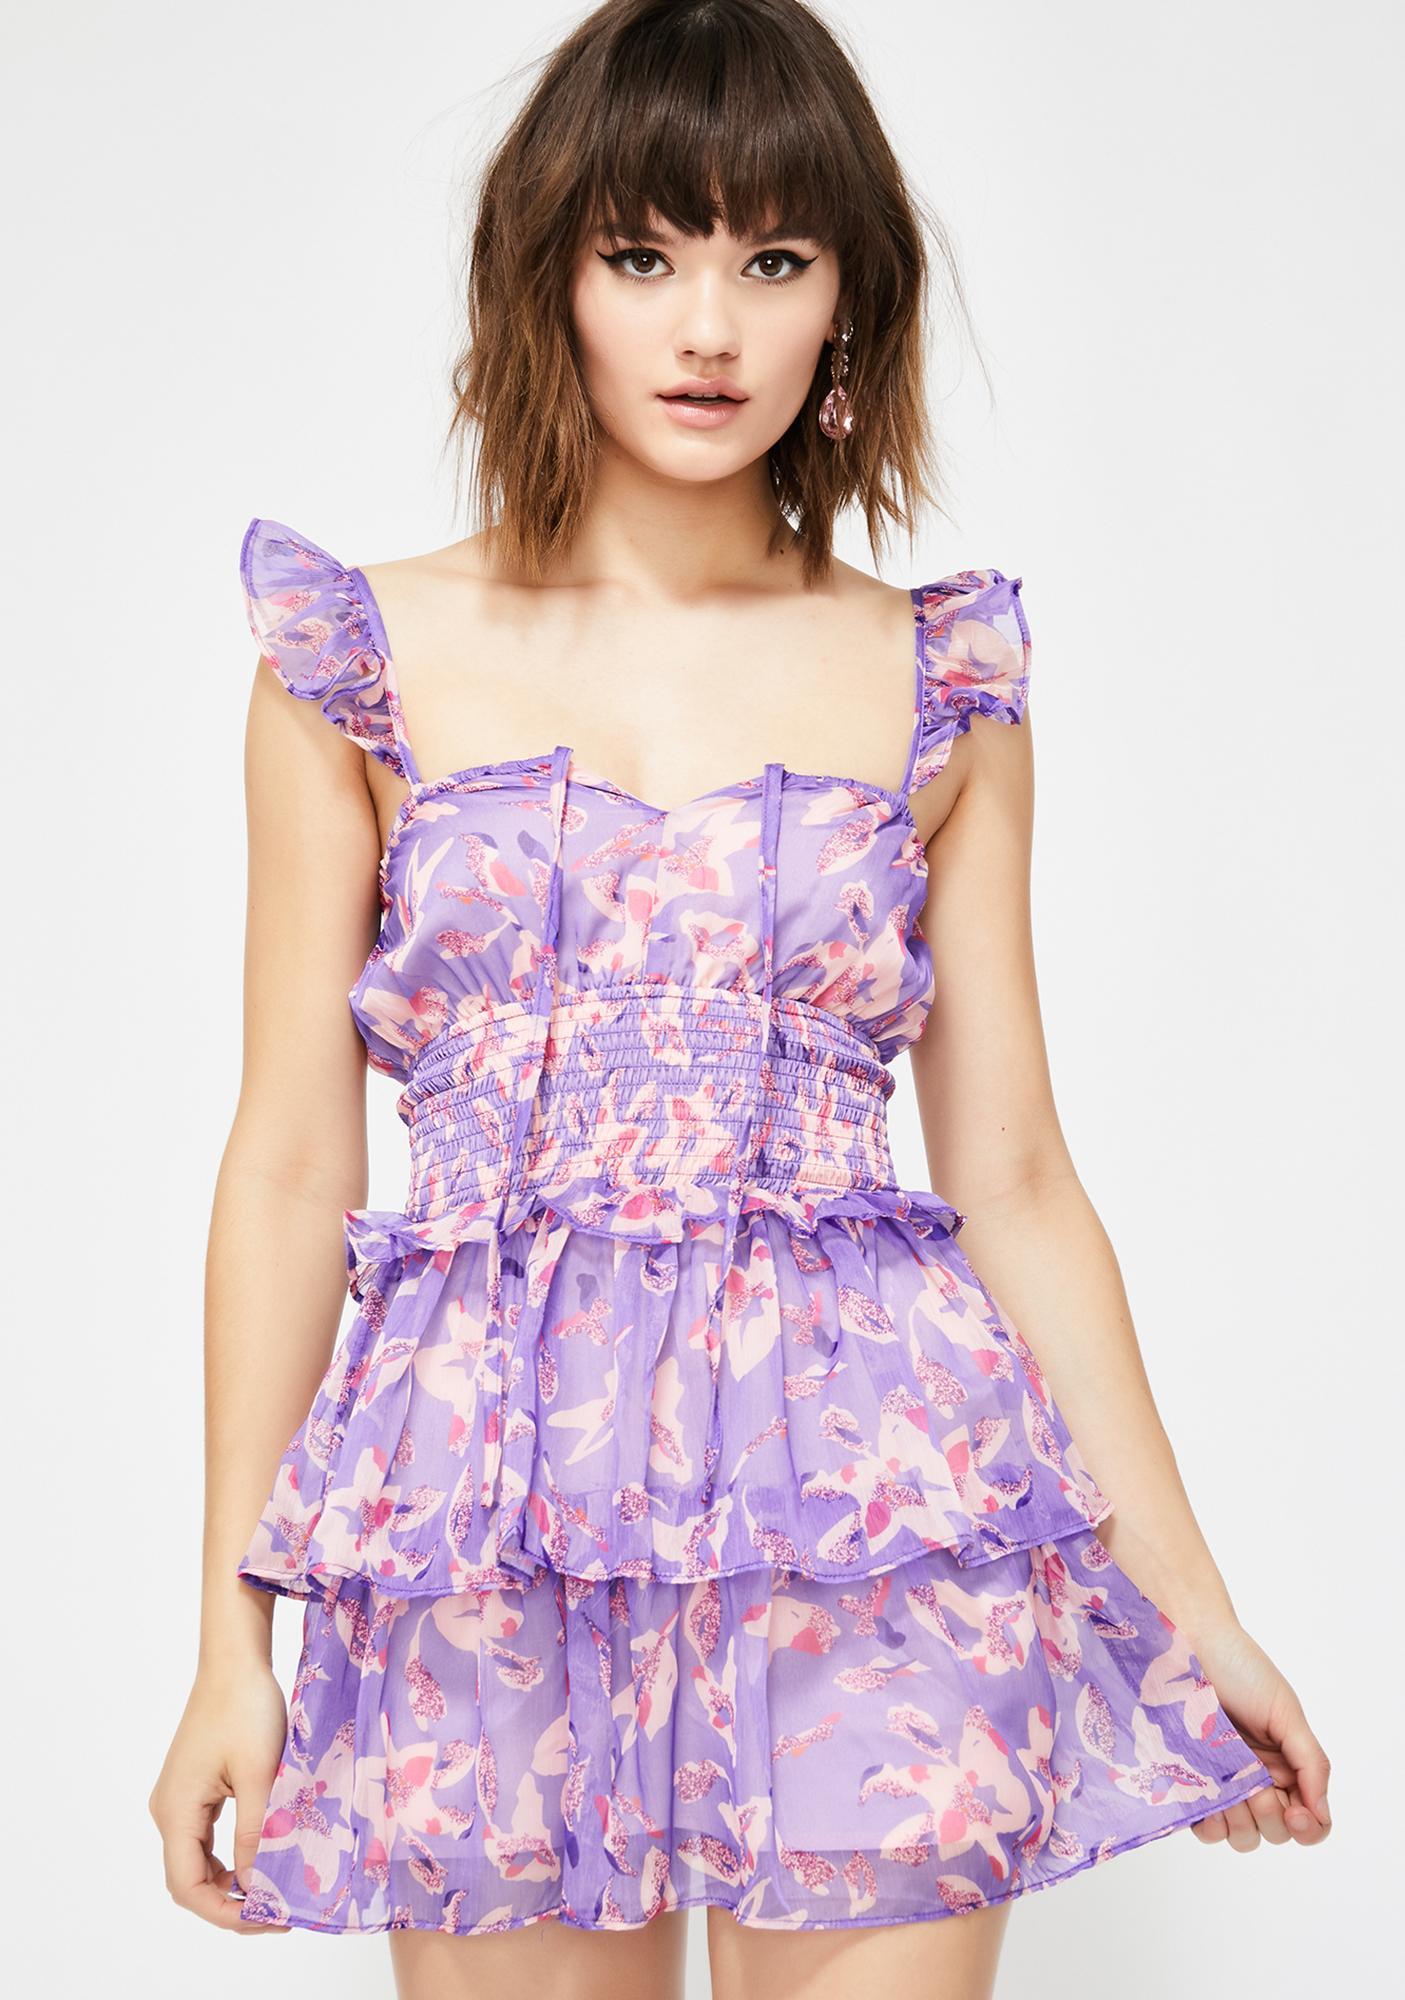 a46c48144eef Purple Flowy Floral Layered Mini Dress